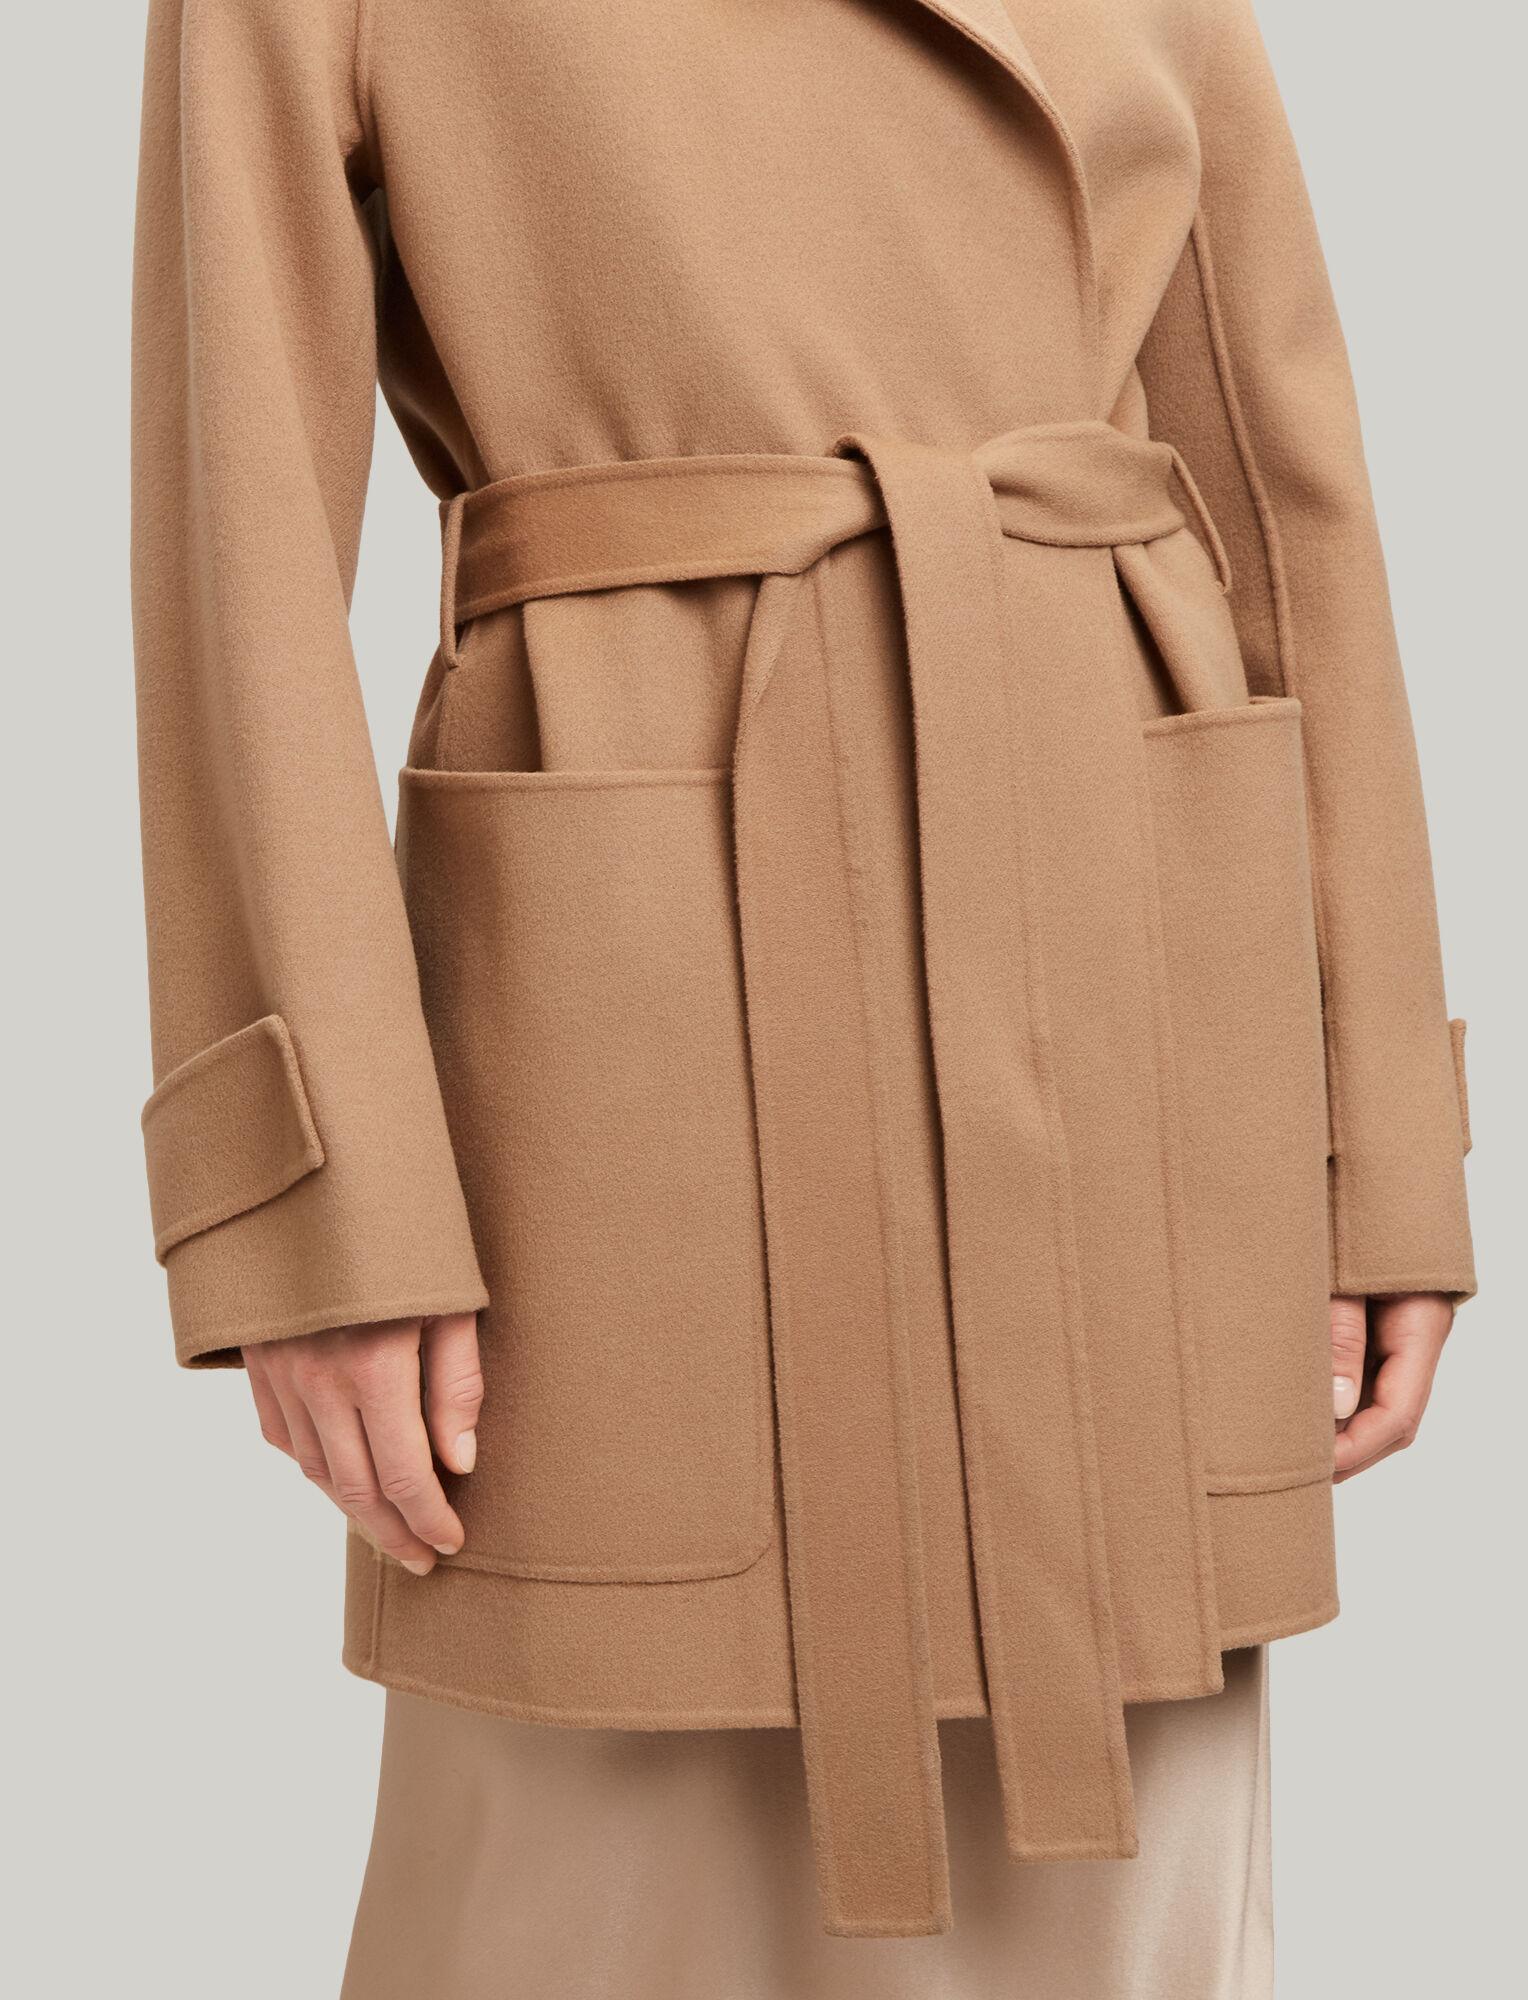 e57fdb44658 ... Joseph, Lista Short Double Wool Gloss Coat, in CAMEL ...